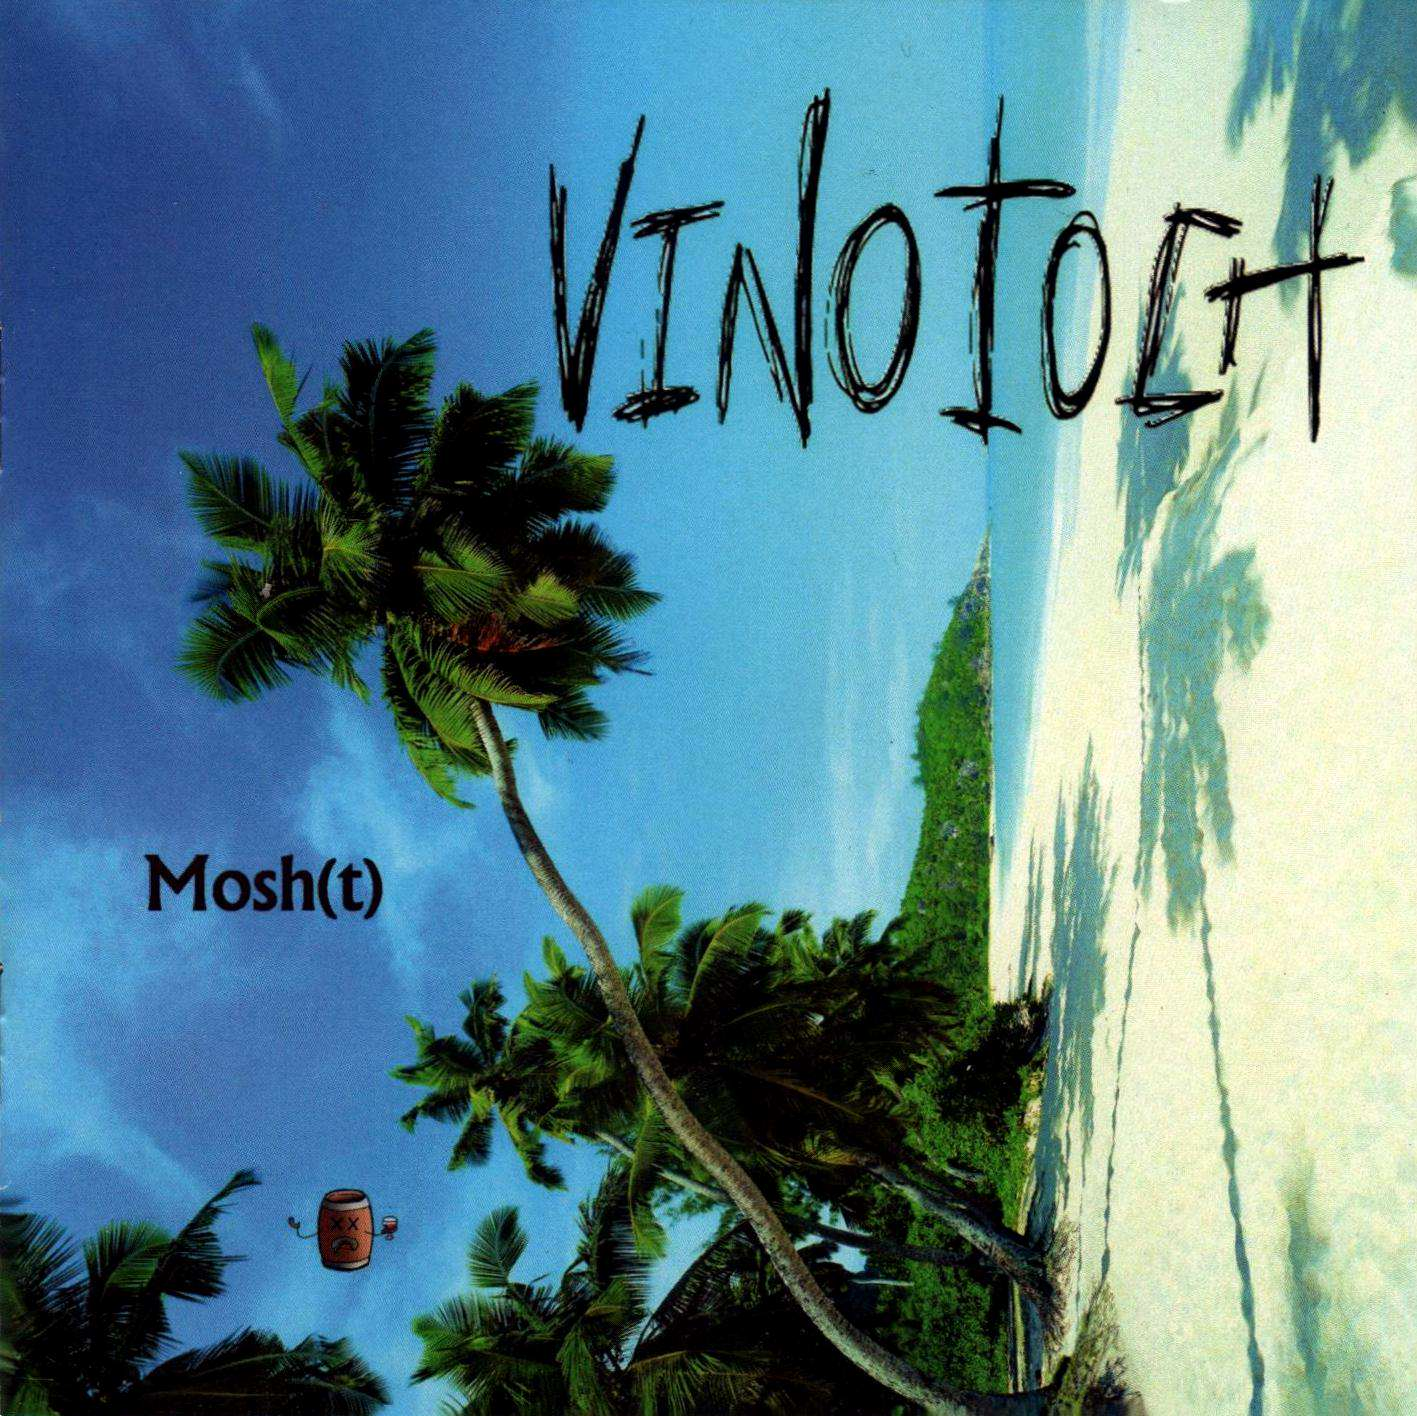 CD – Vinotoch : Mosh(t)